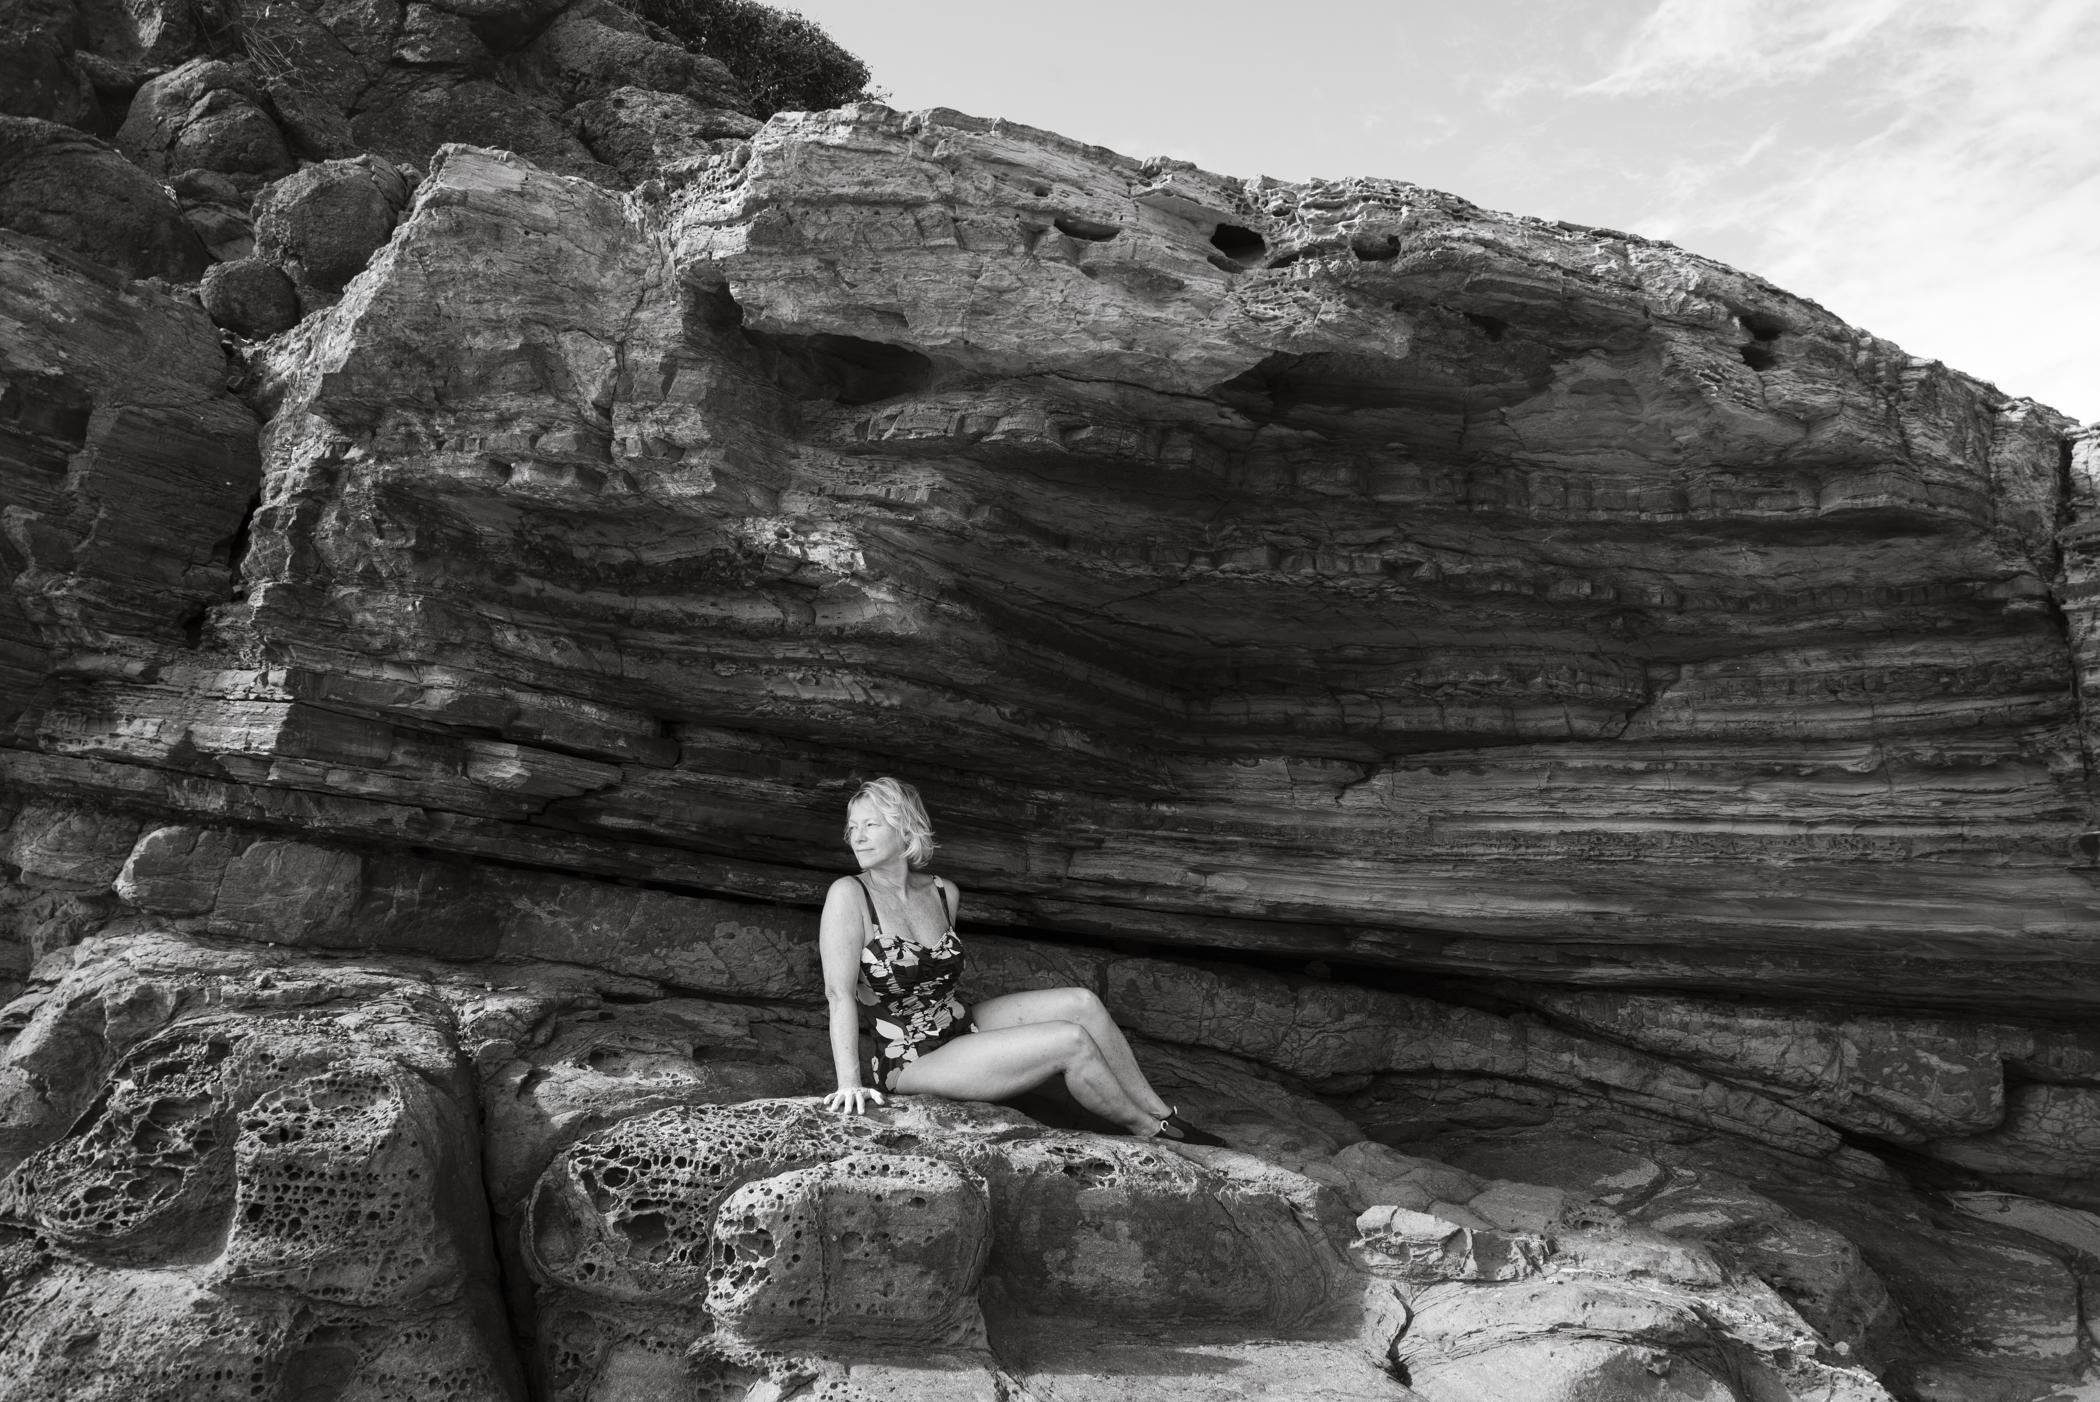 012014-Culebra-JuliaLuckettPhotography-162